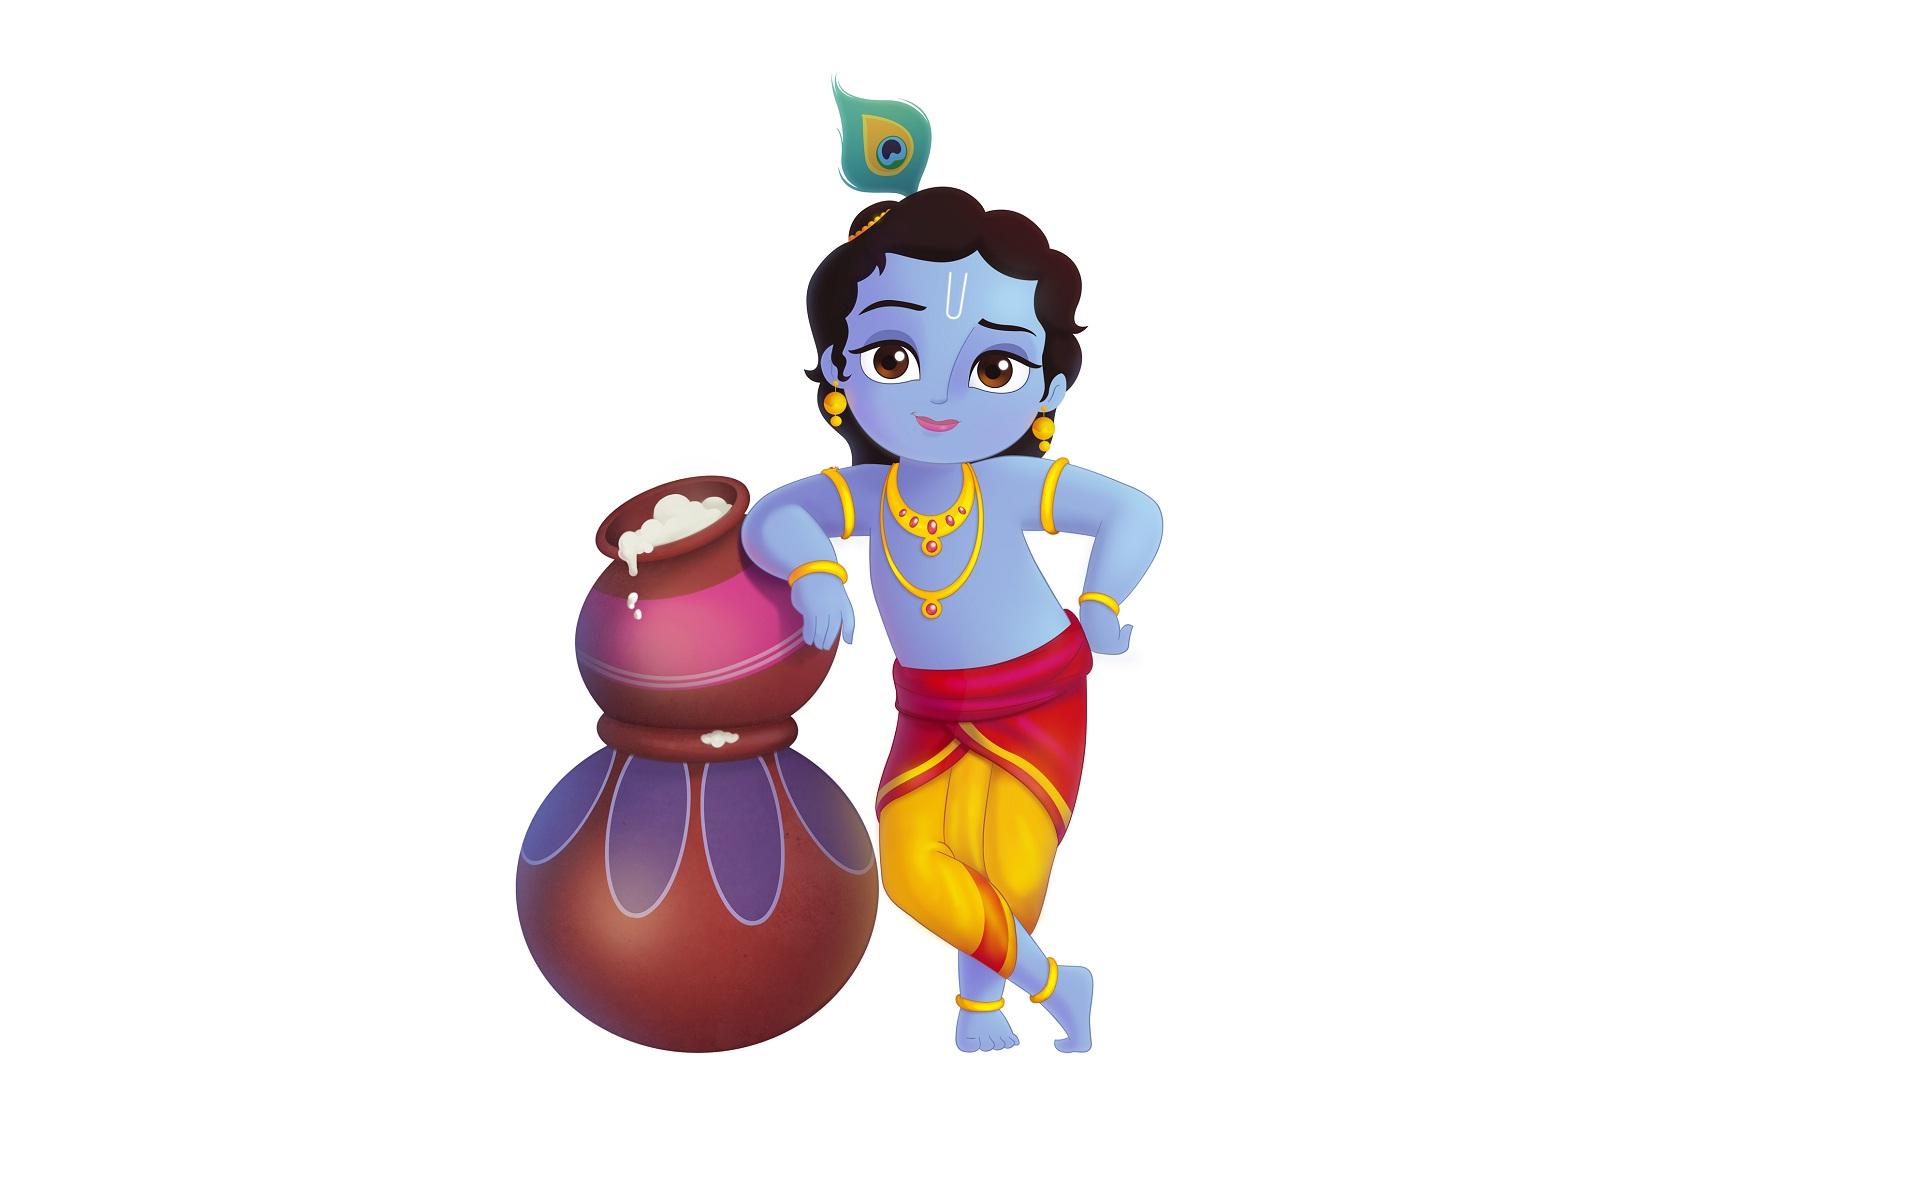 Little Krishna Wallpapers Cartoon Hq Little Krishna Pictures 4k Wallpapers 2019